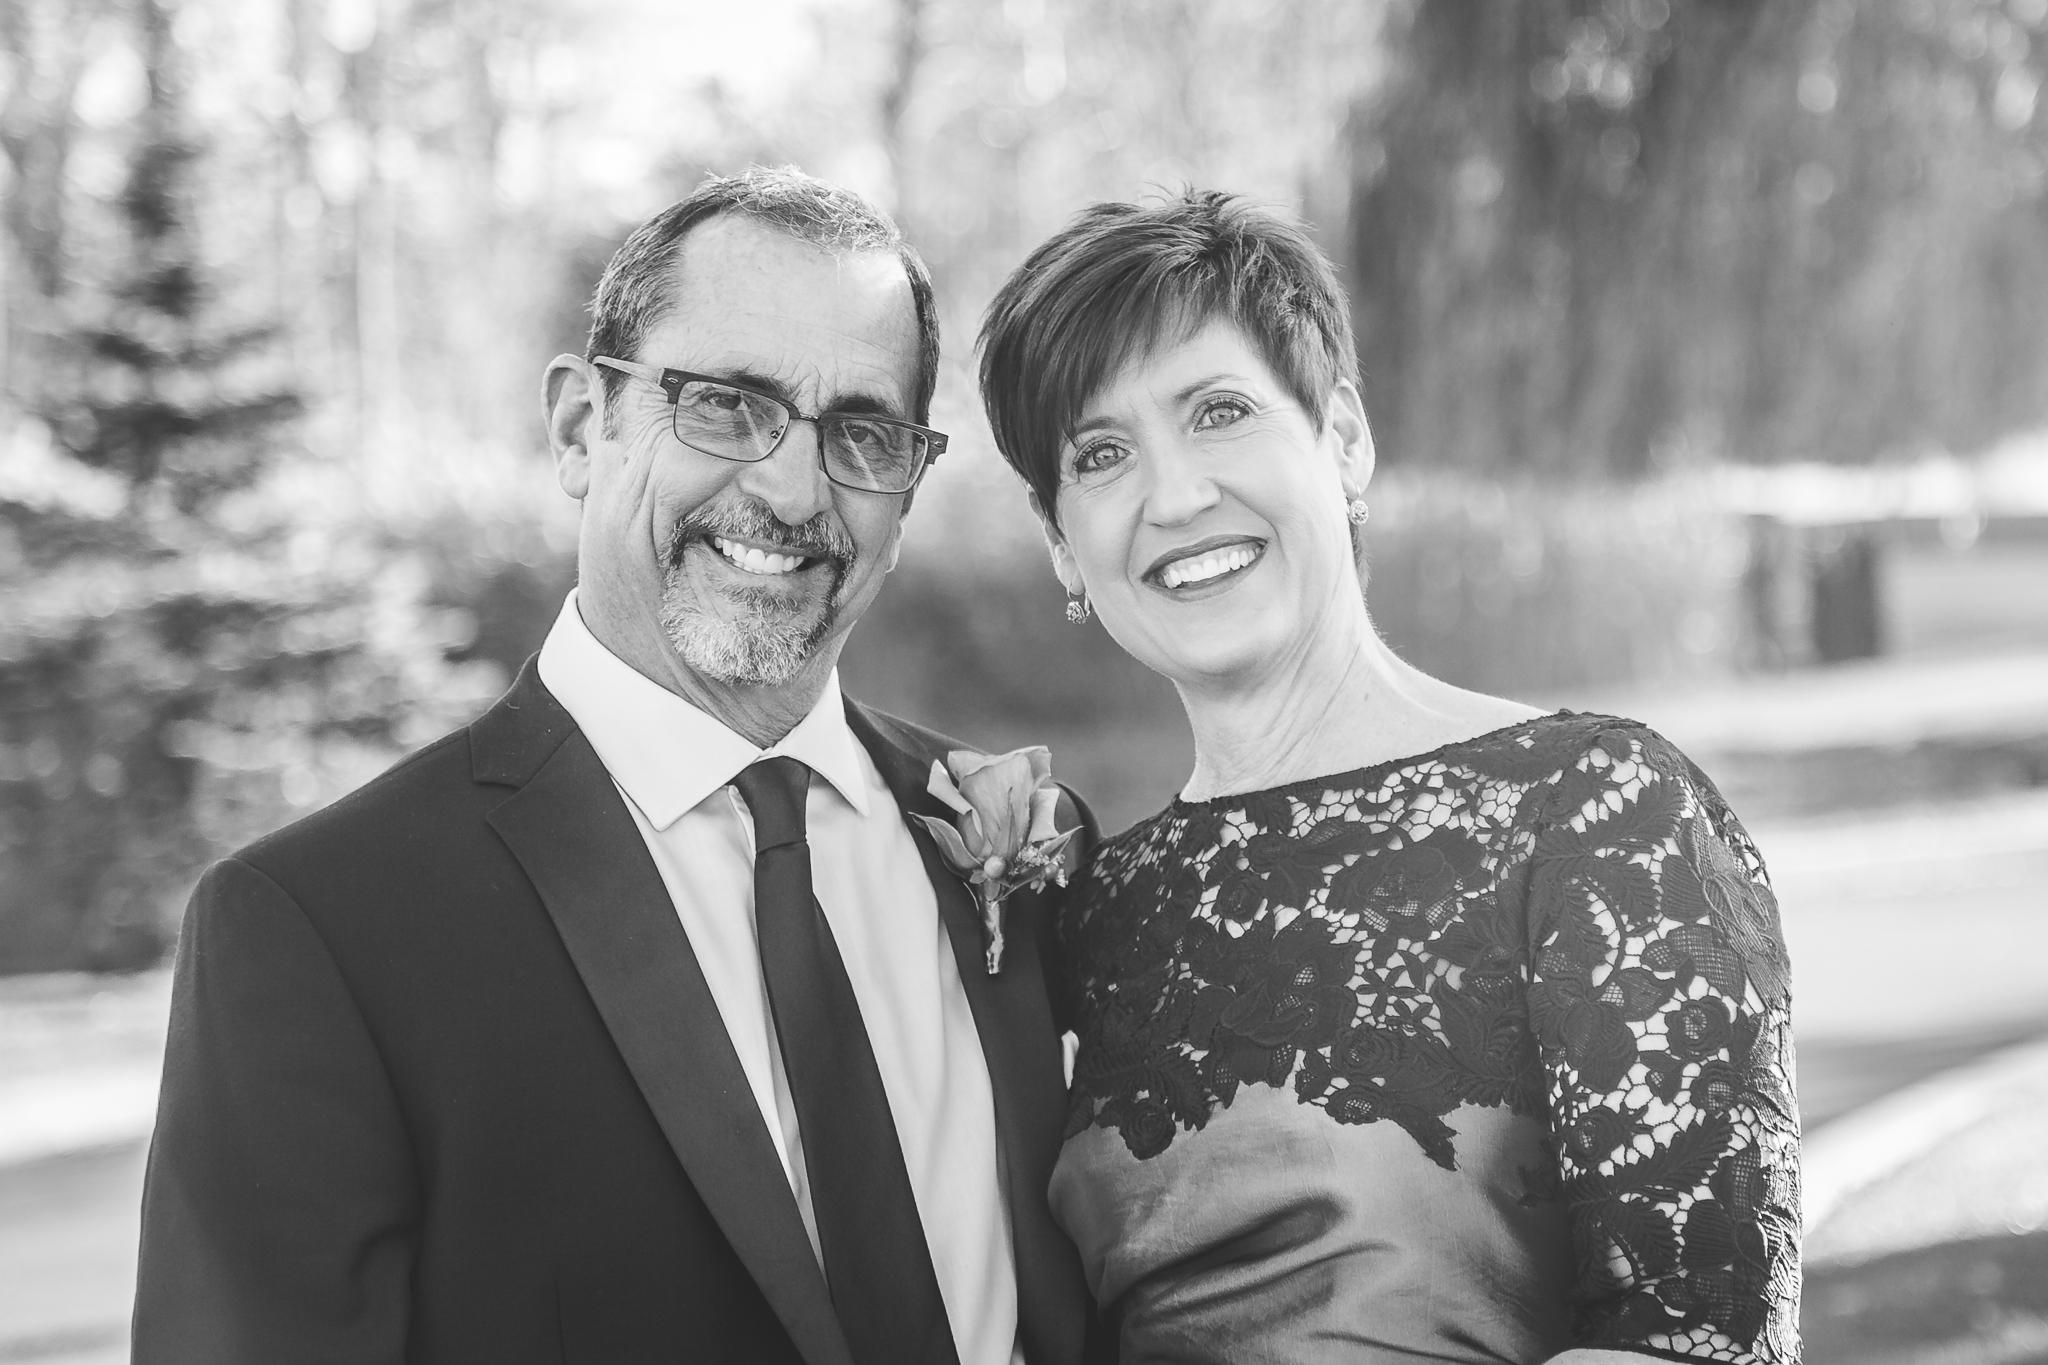 camuglia-whomstudio-chelsea_and_andy-nycphotographer-wedding-brooklyn-buffalo-timberlodge-031-5306.jpg